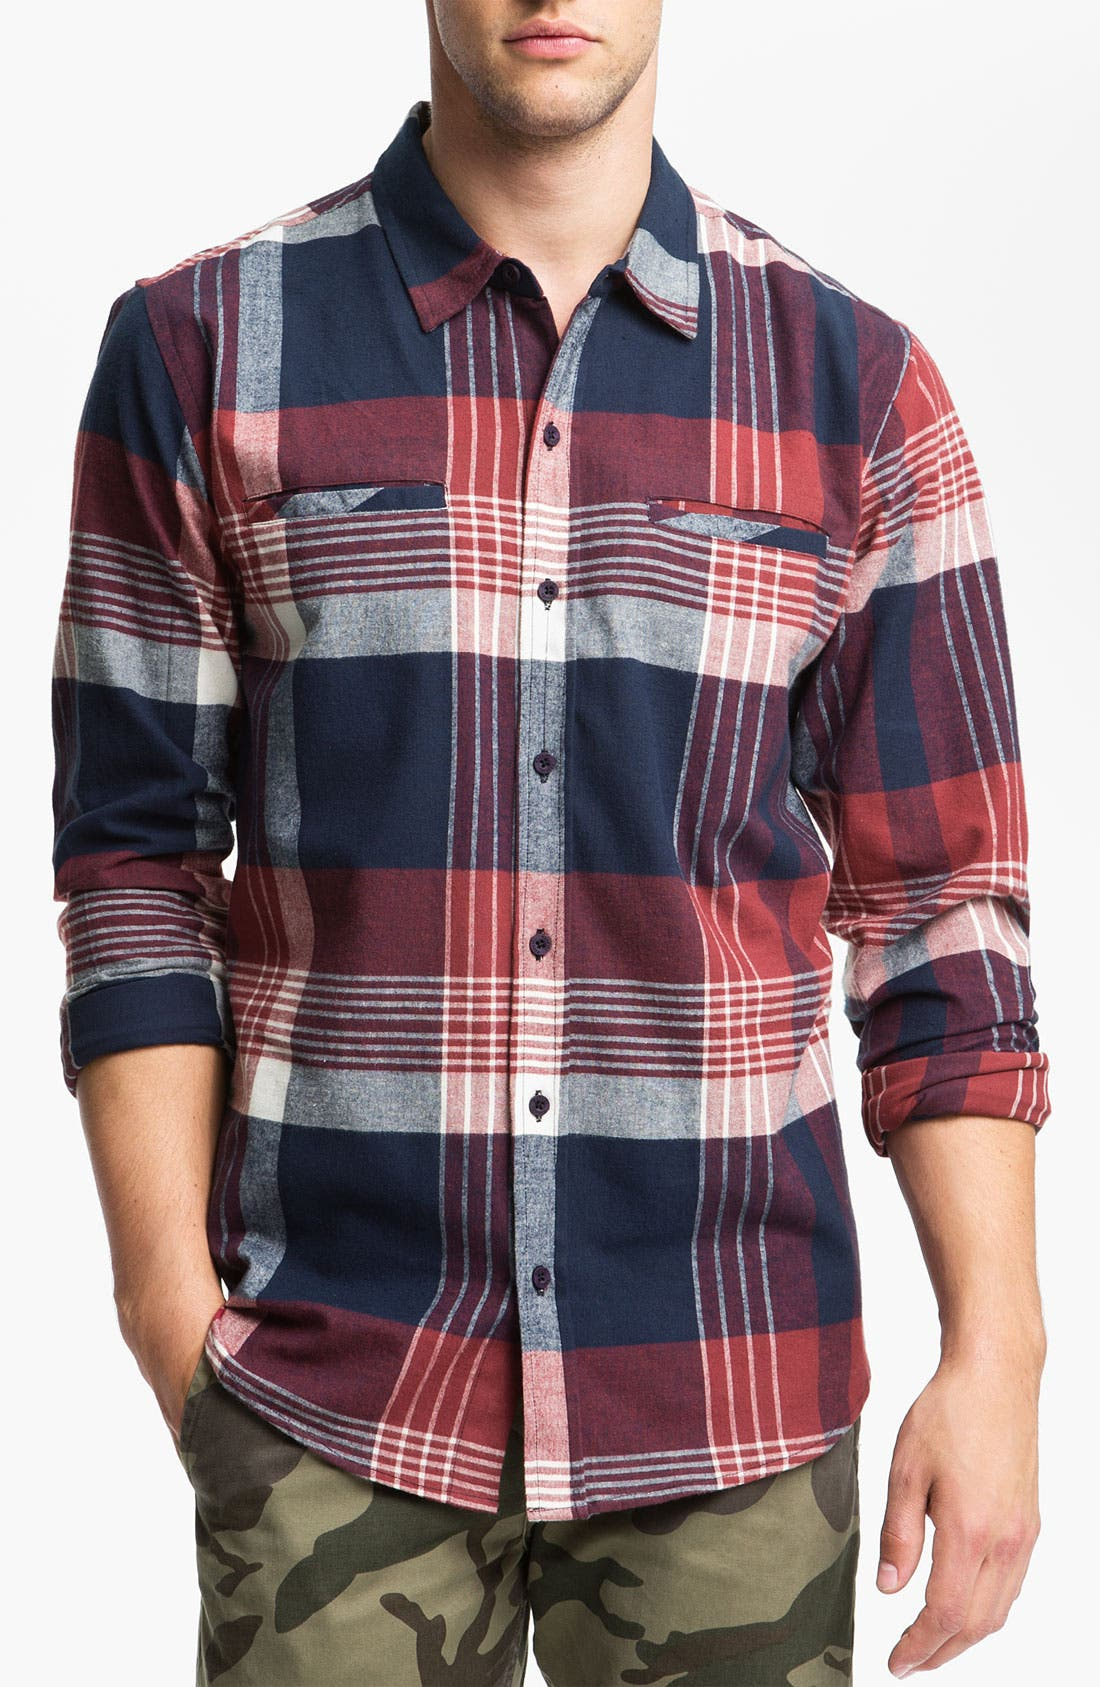 Alternate Image 1 Selected - Ezekiel 'Lakeport' Plaid Flannel Shirt